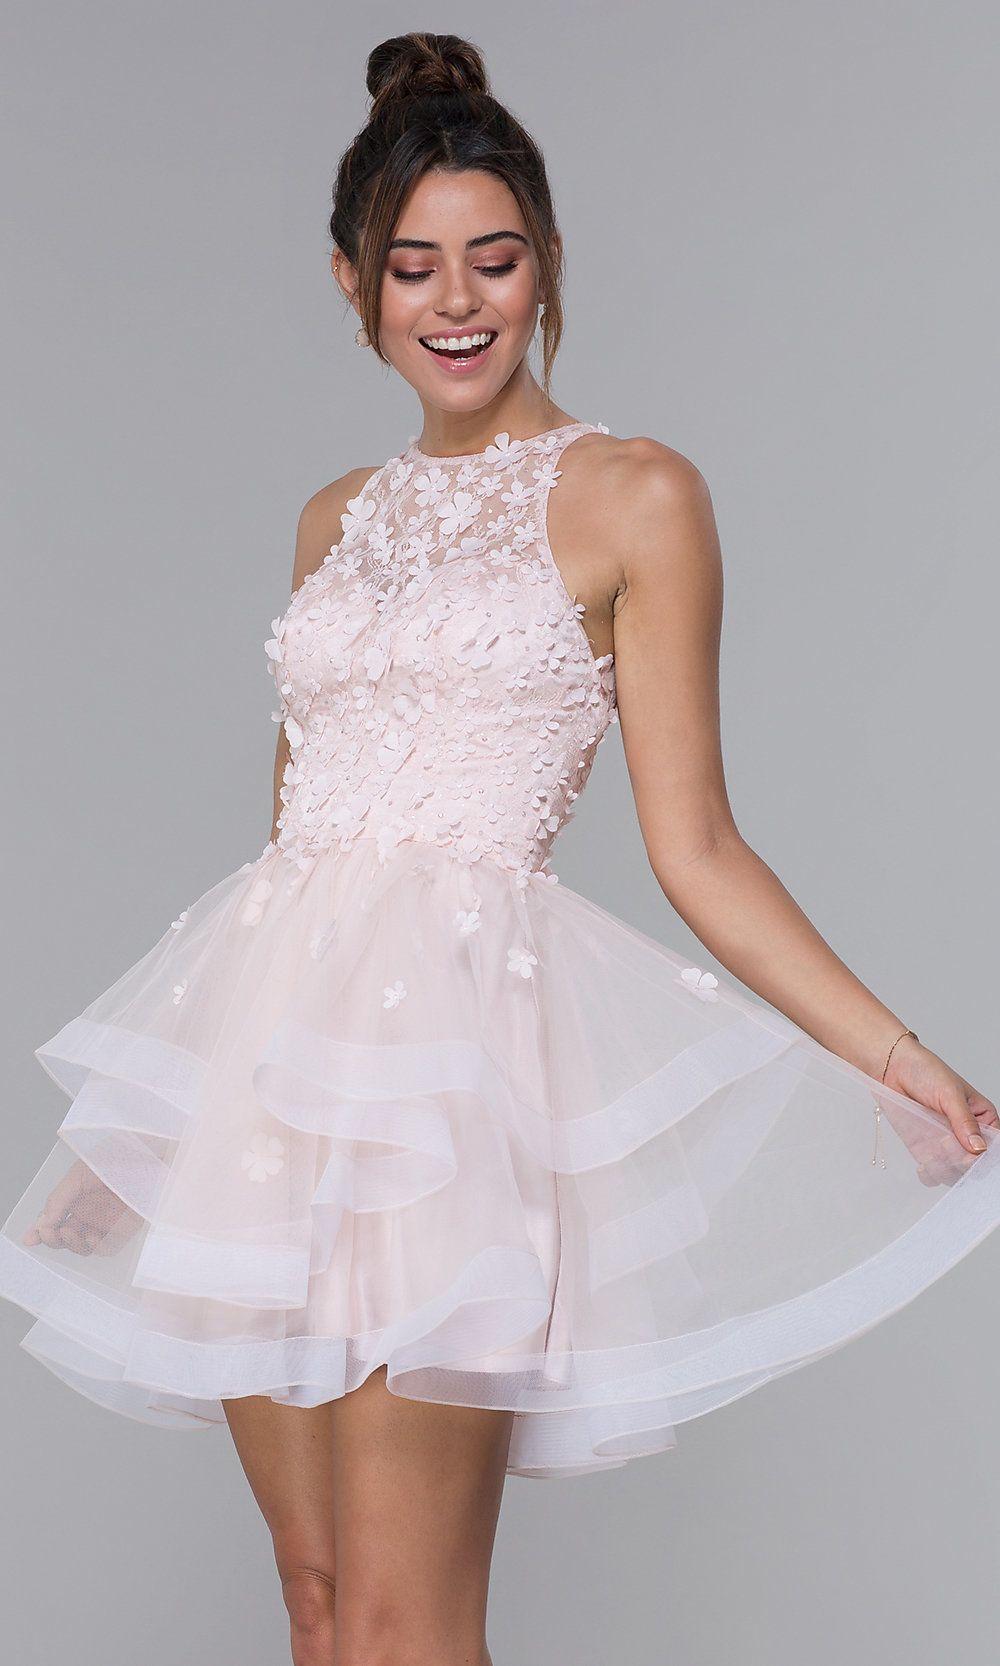 Lace-Bodice Satin Short Homecoming Dress - PromGirl